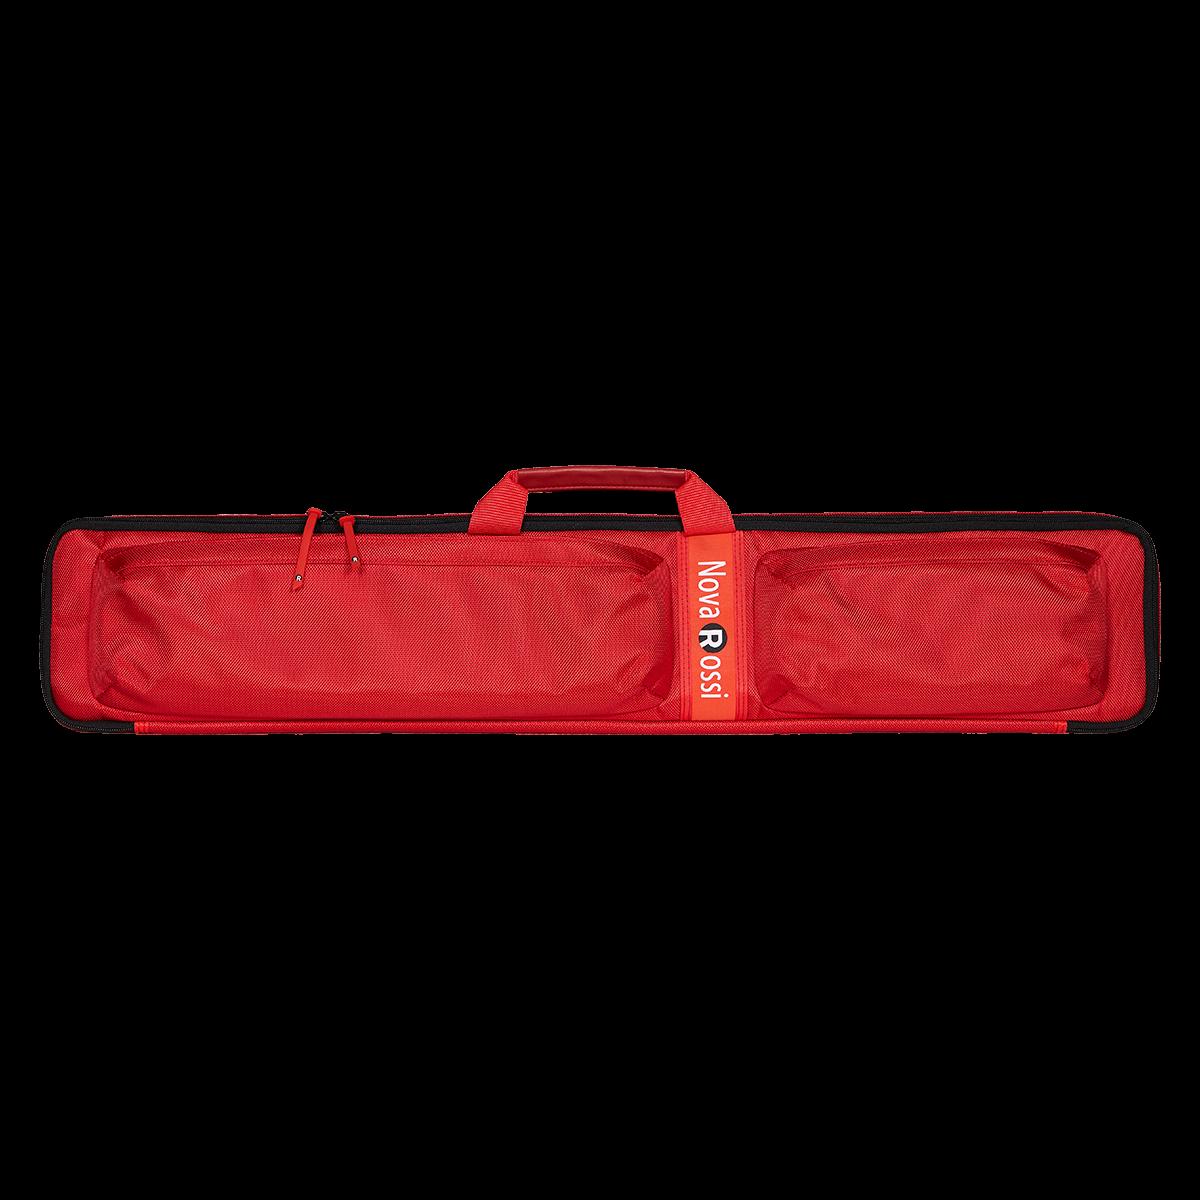 NovaRossi bag Red 2/4